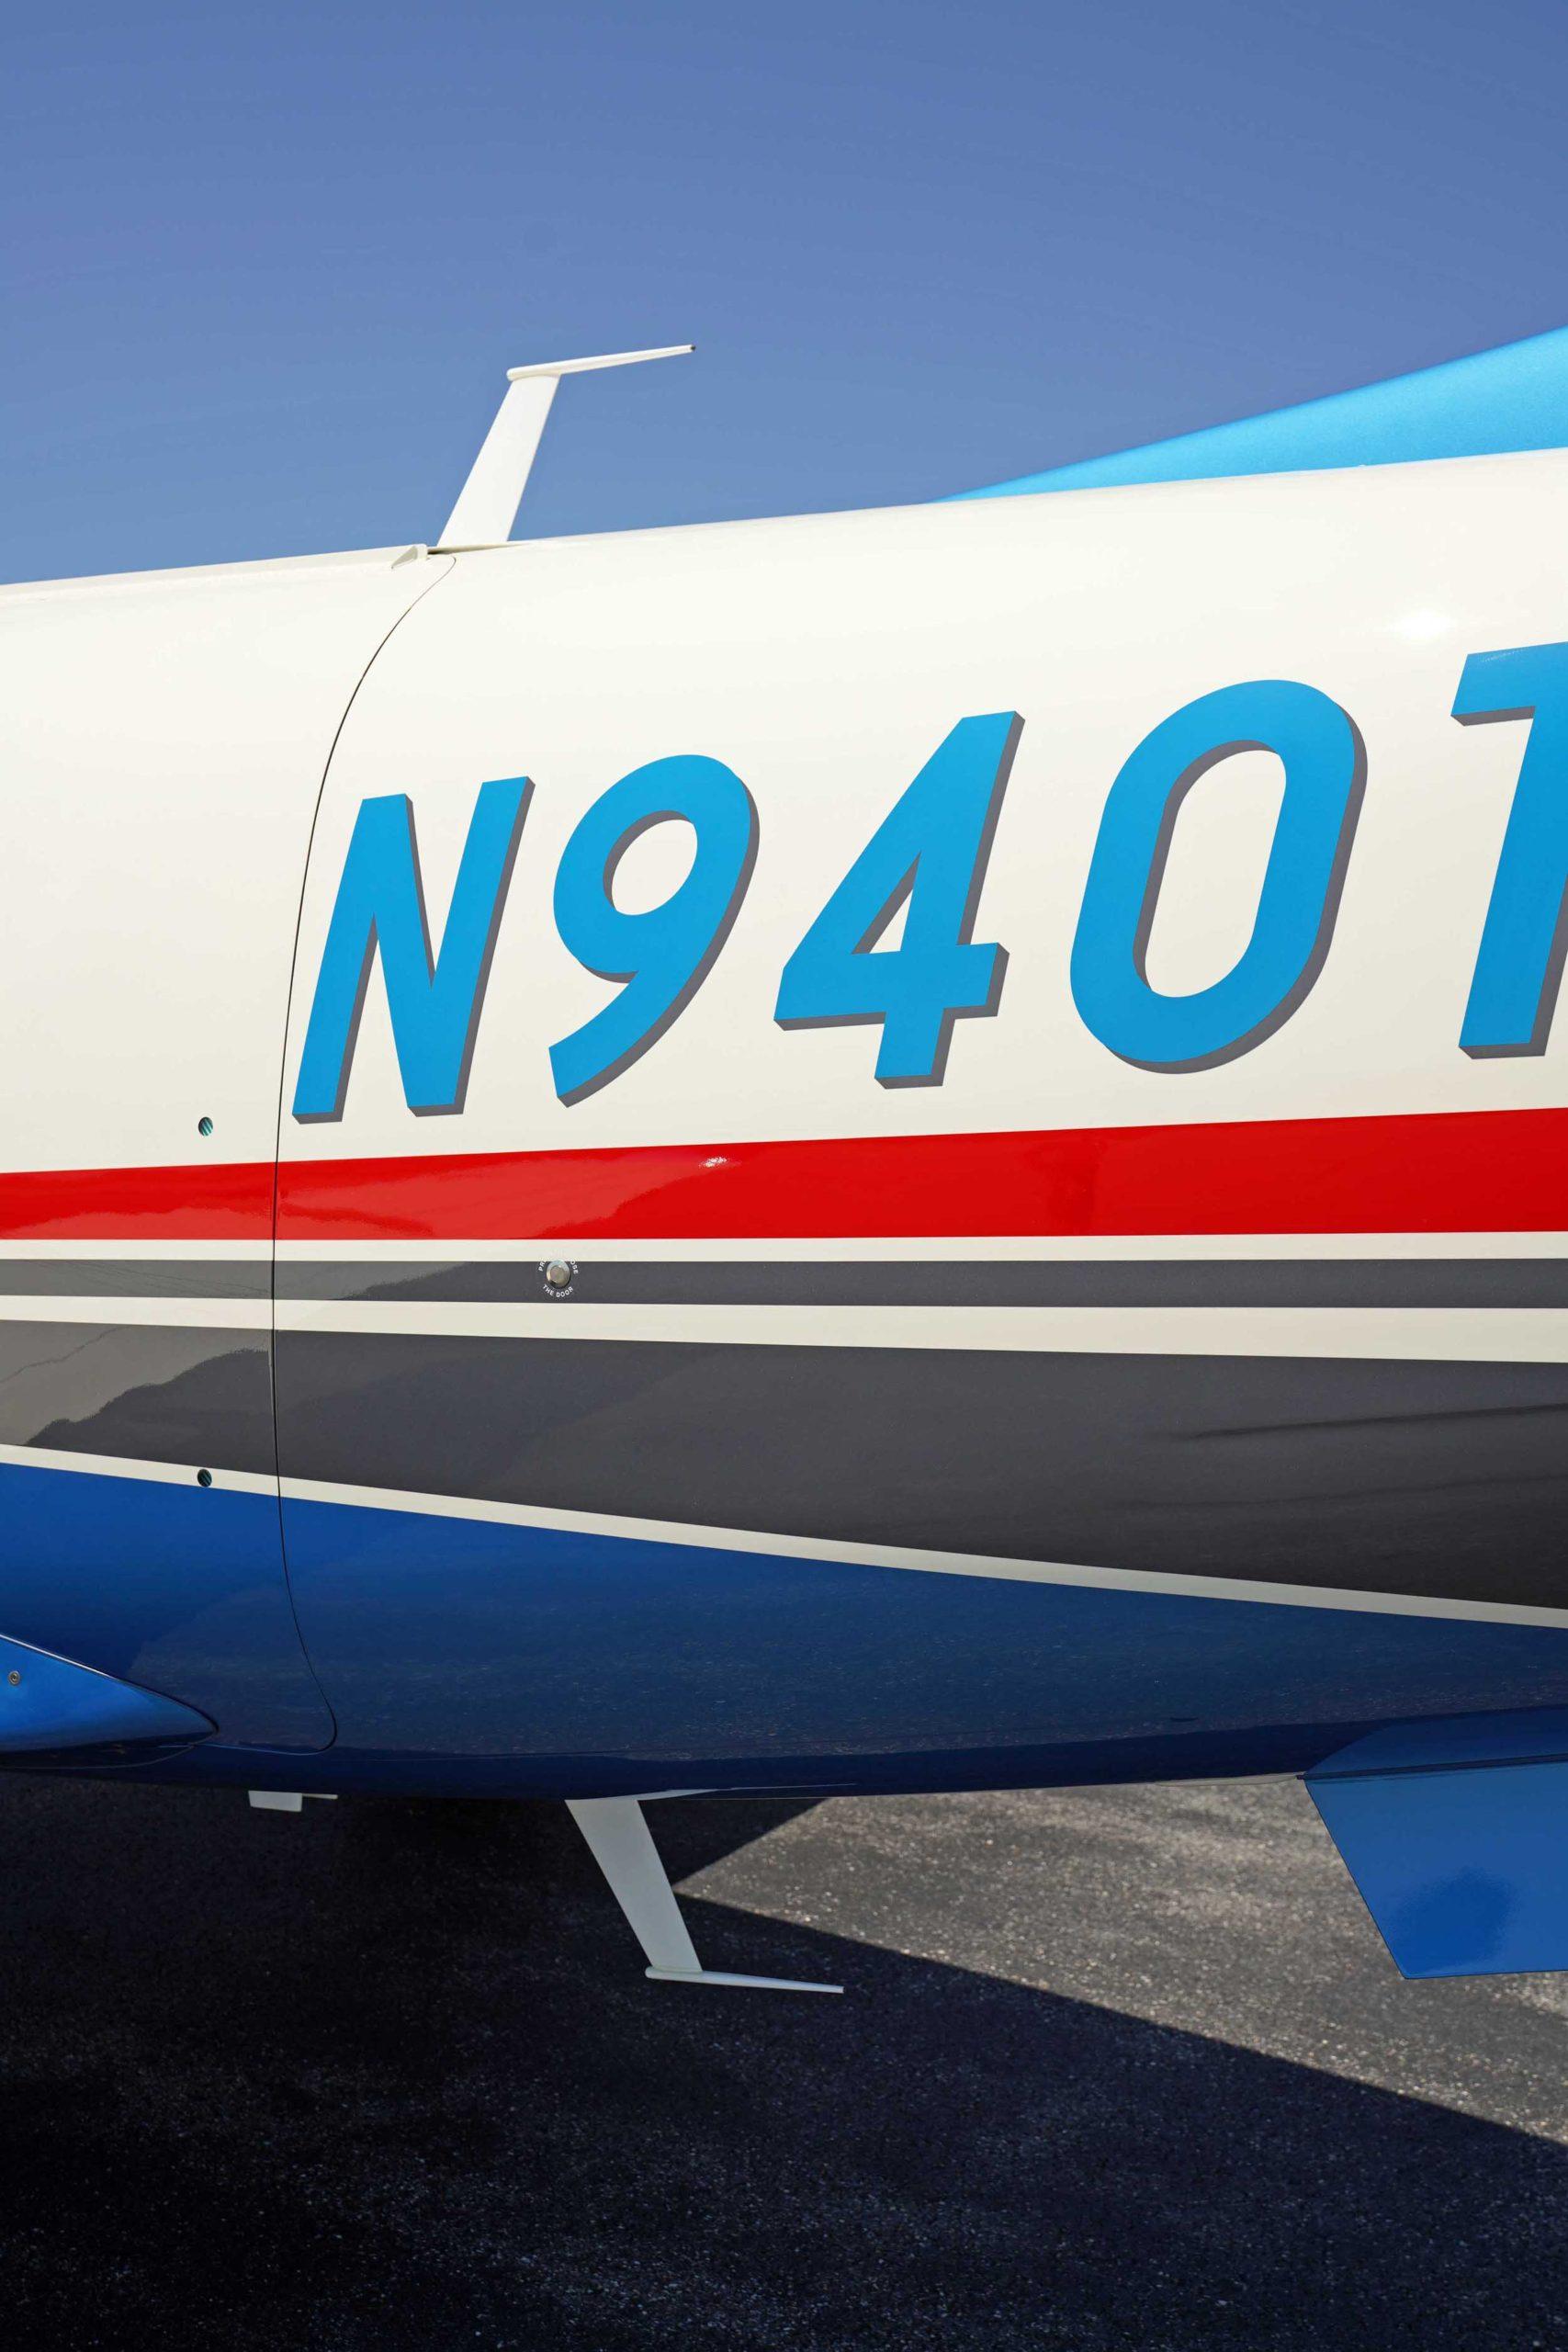 N940TM Ext Detail web